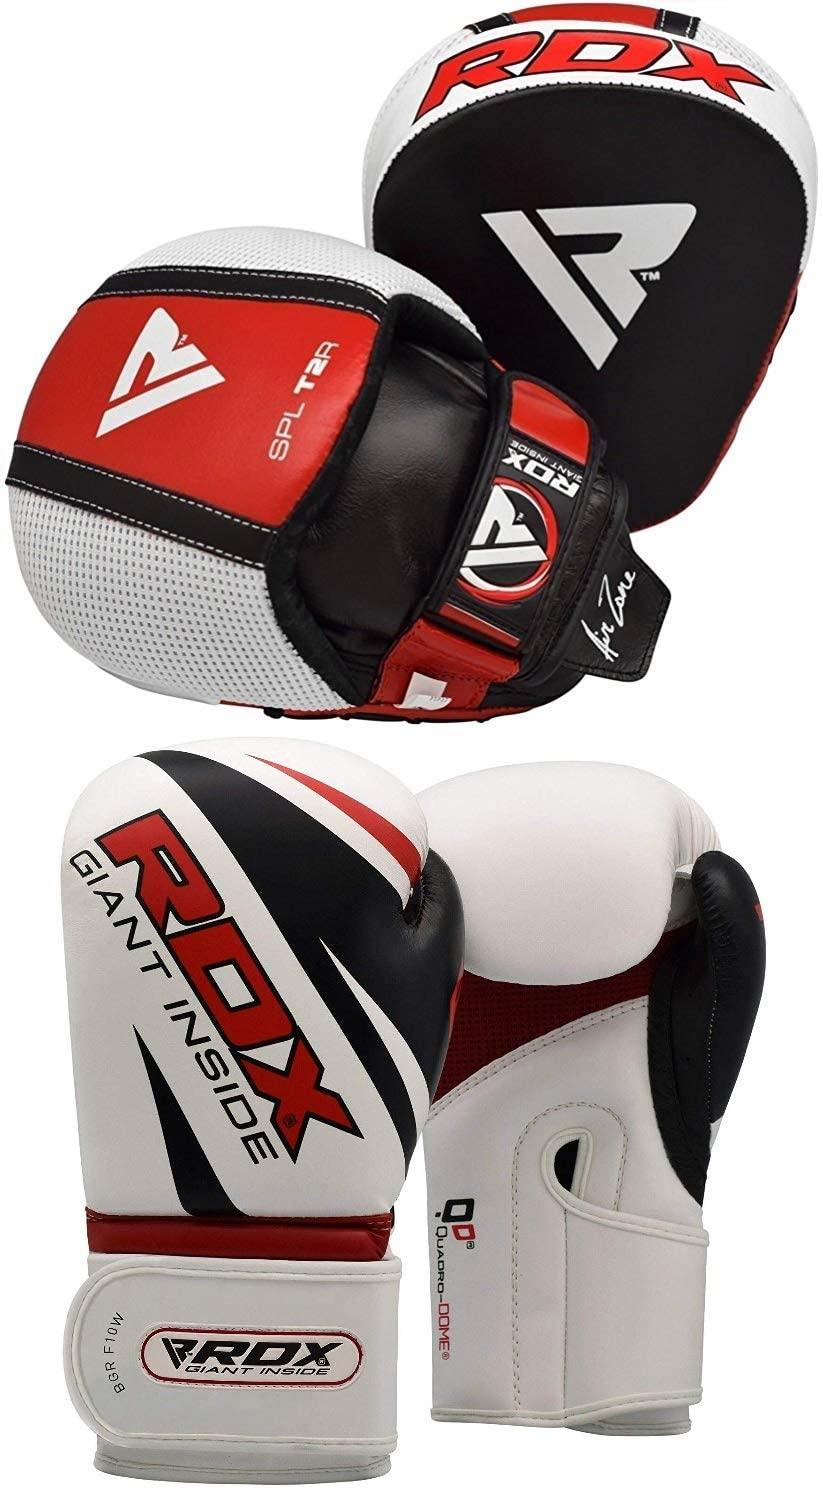 RDX Smartie Pads MMA Boxing Gloves Punch Target Focus Training Punching Hook & Jab Thai Strike Kick Shield